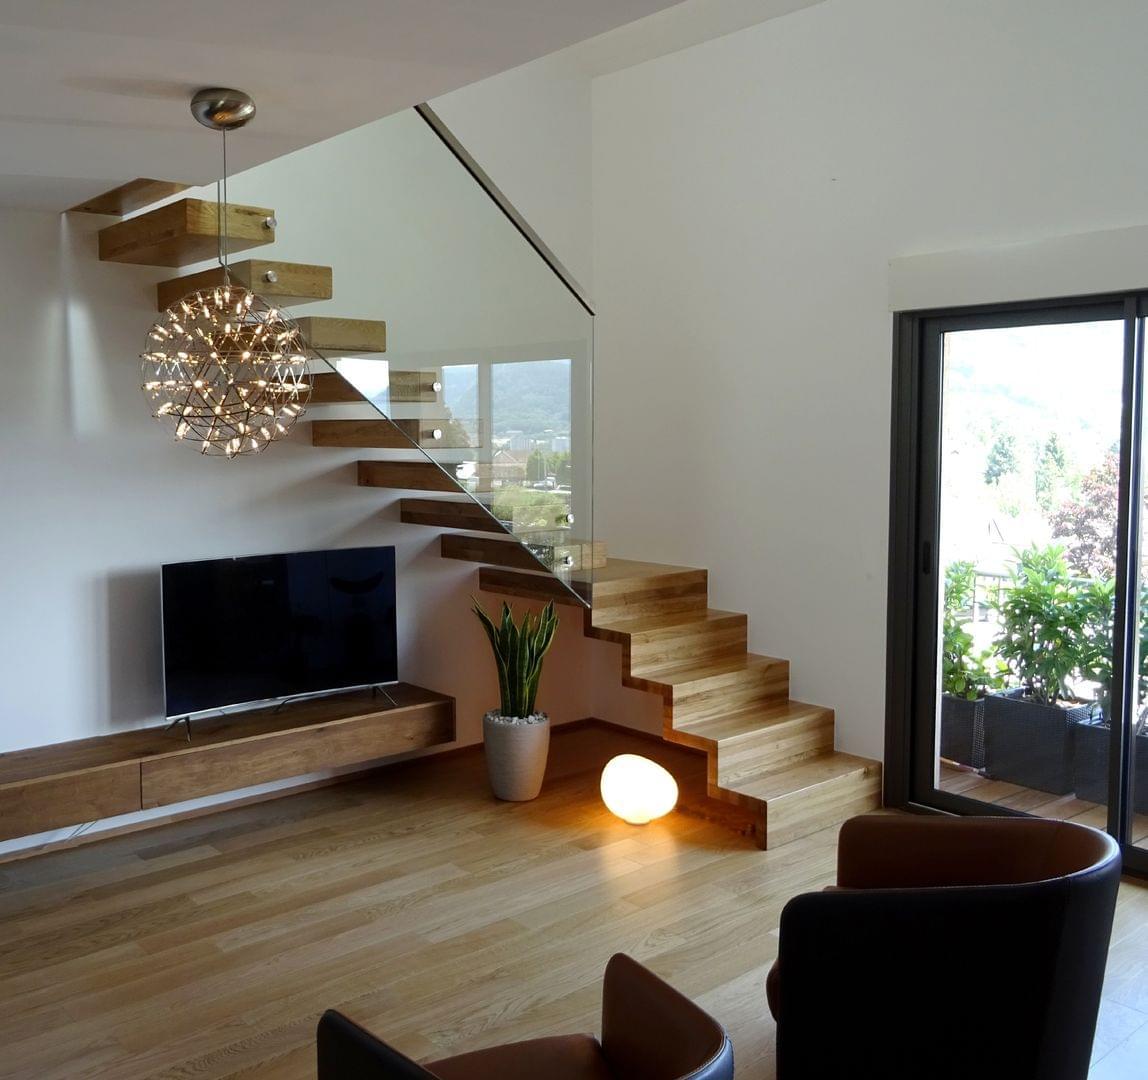 Escalier Design - Escaliers autoporteurs Design Ego ...